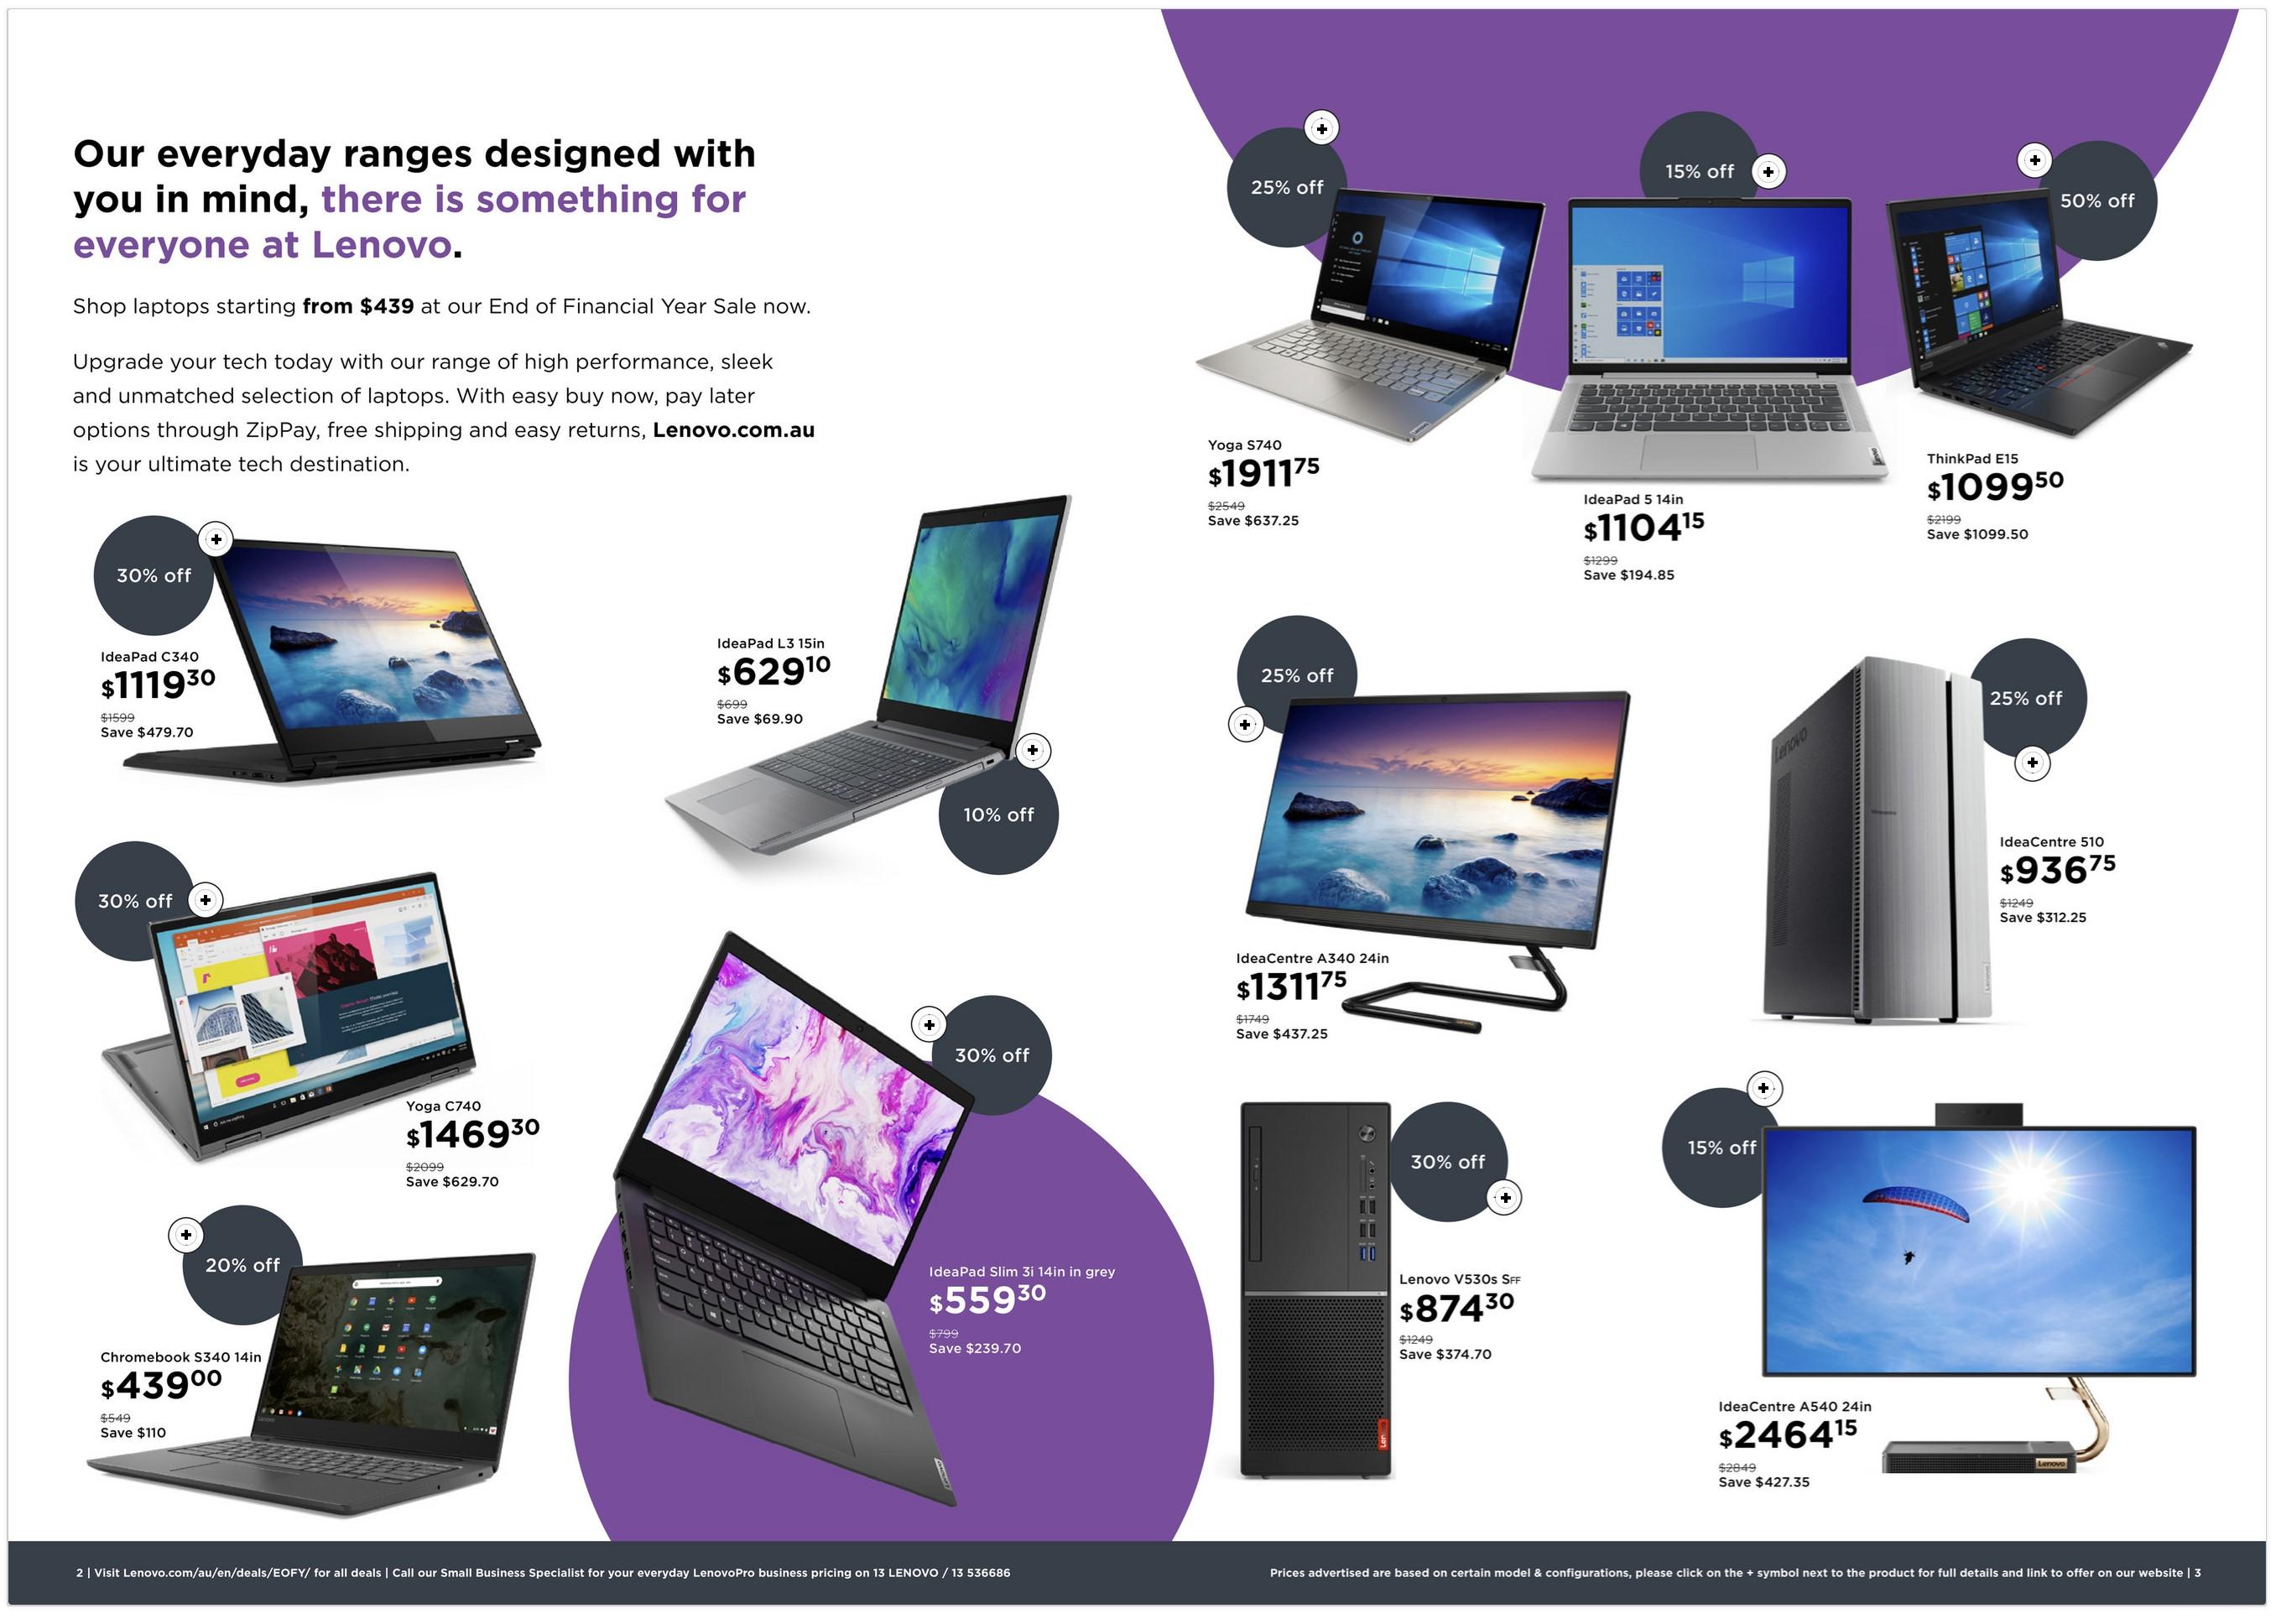 Lenovo Eofy 2020 Deals Big Savings On Thinkpad Legion Yoga And More Trendly News Listennow Everyday 100shortnews Toptrendings Popularnews Reviews Trendlynews